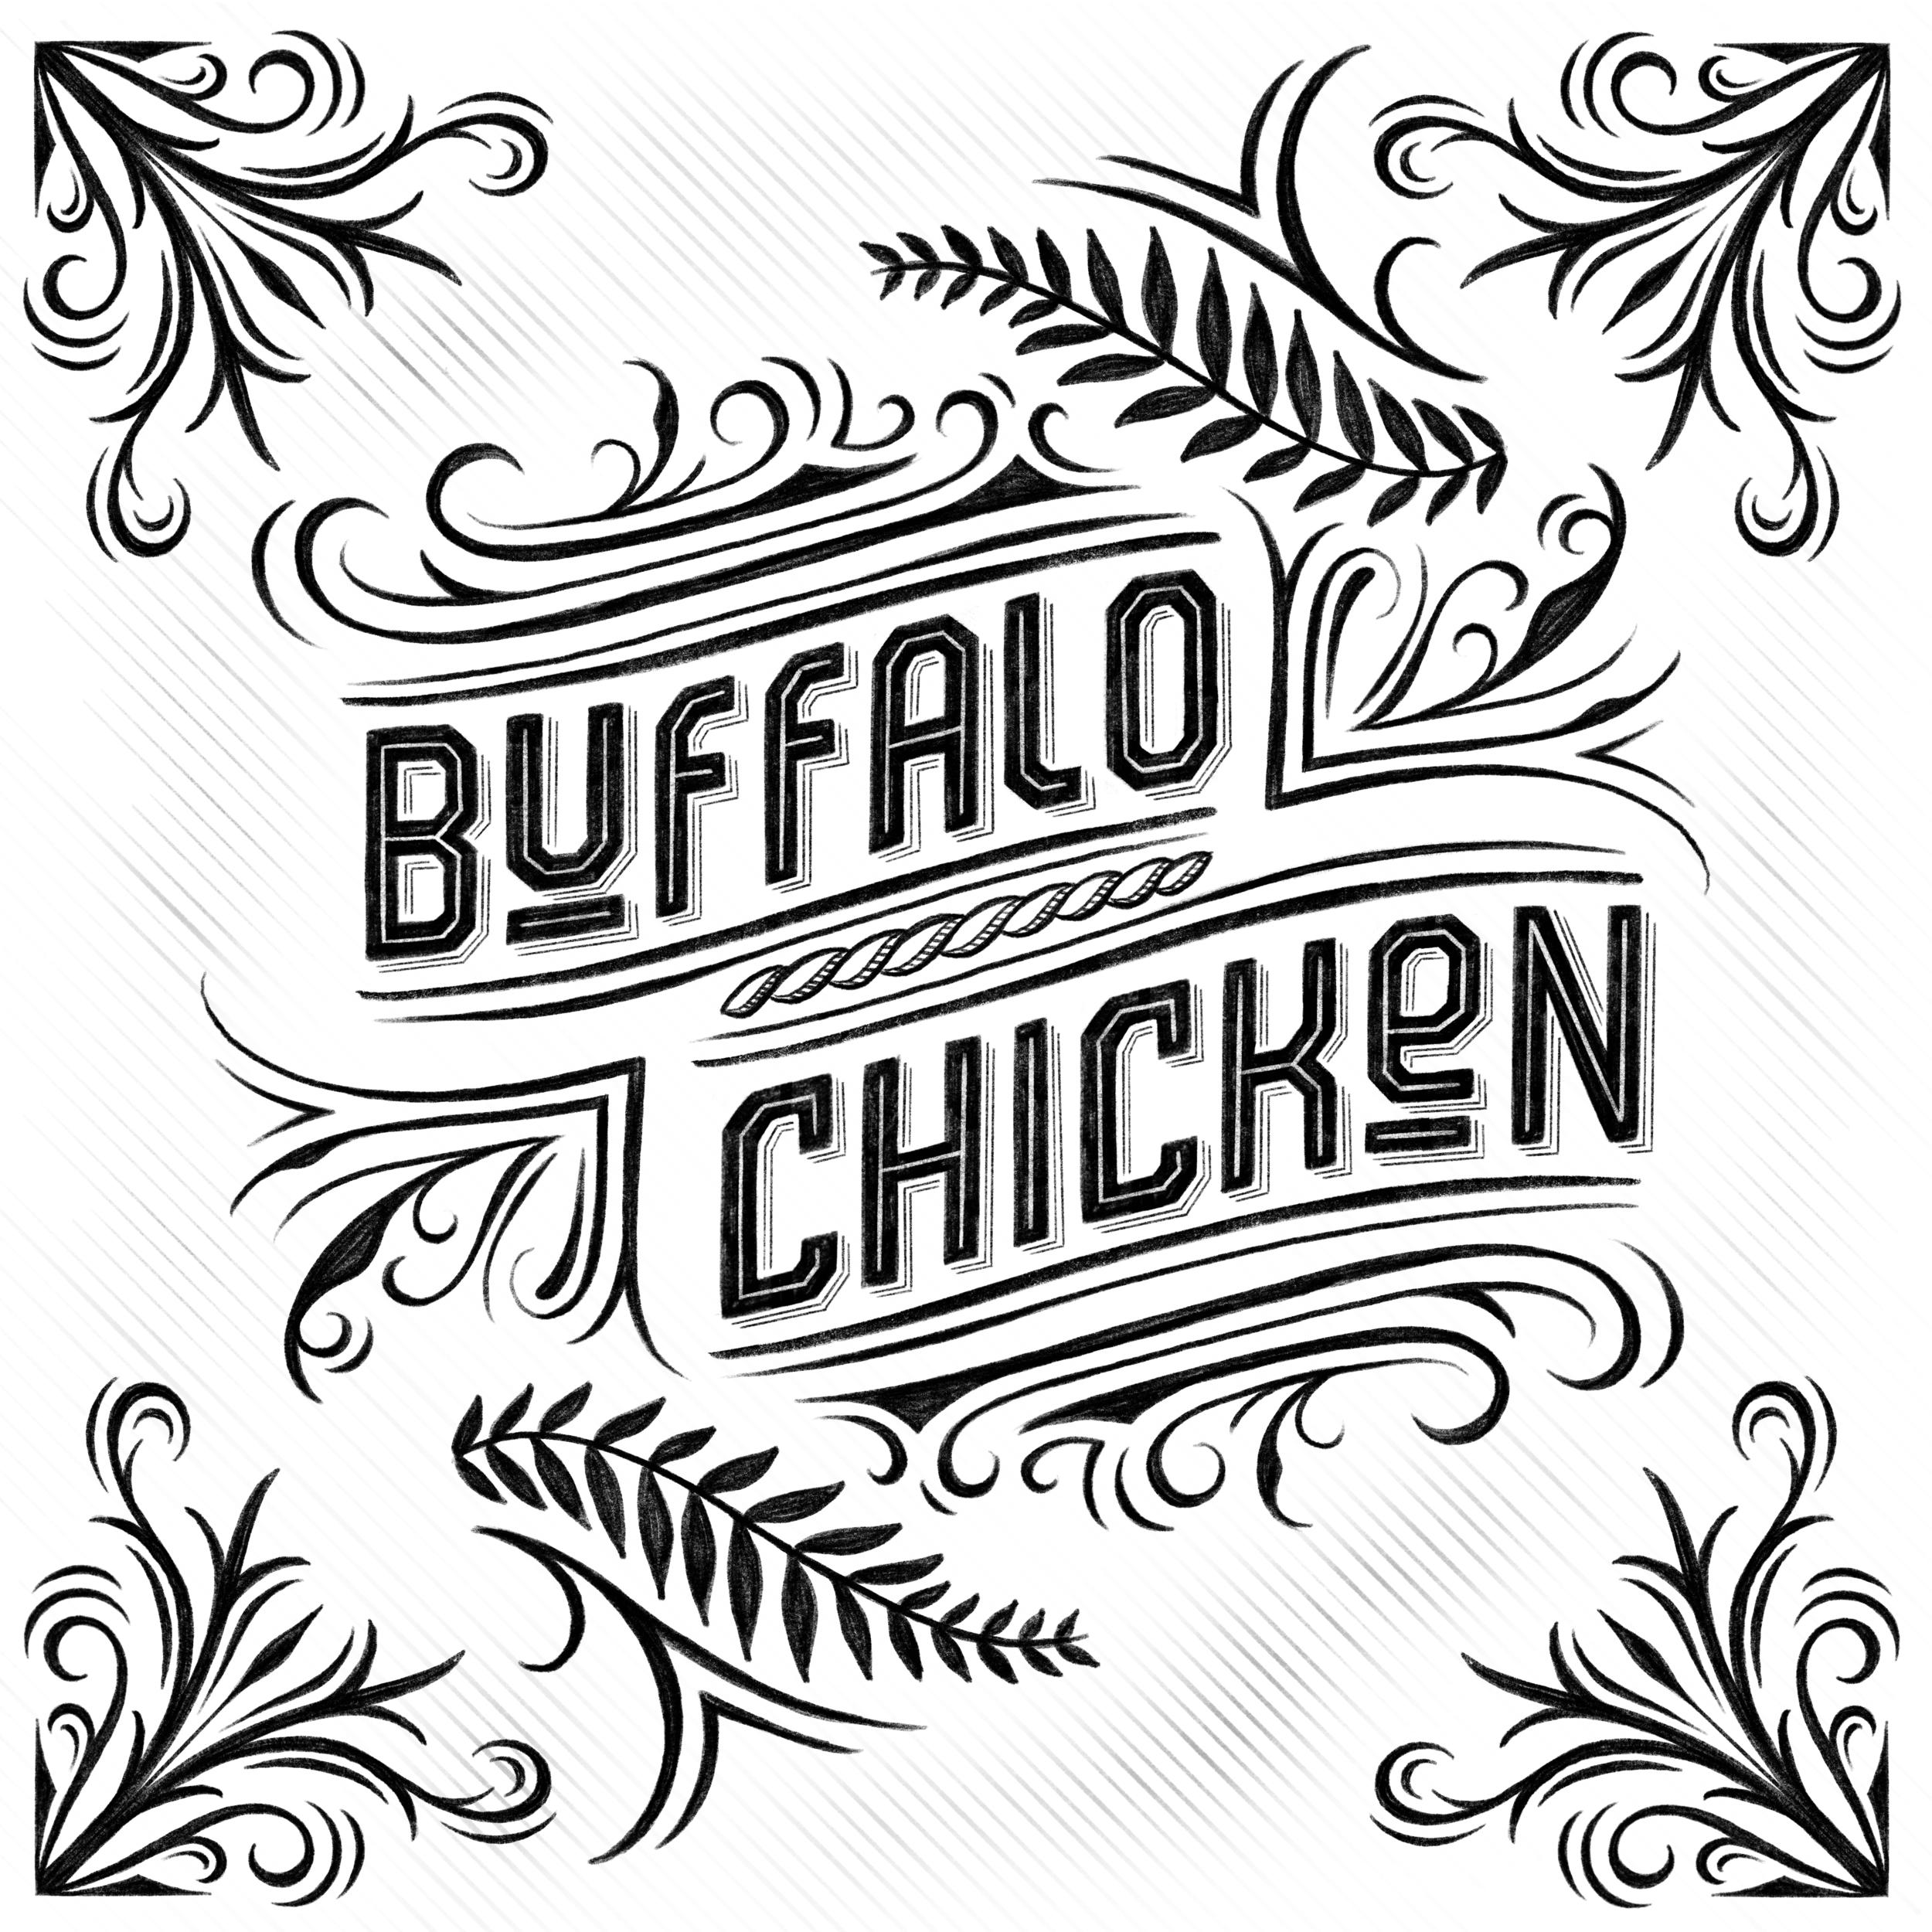 buffalo_chicken copy.png